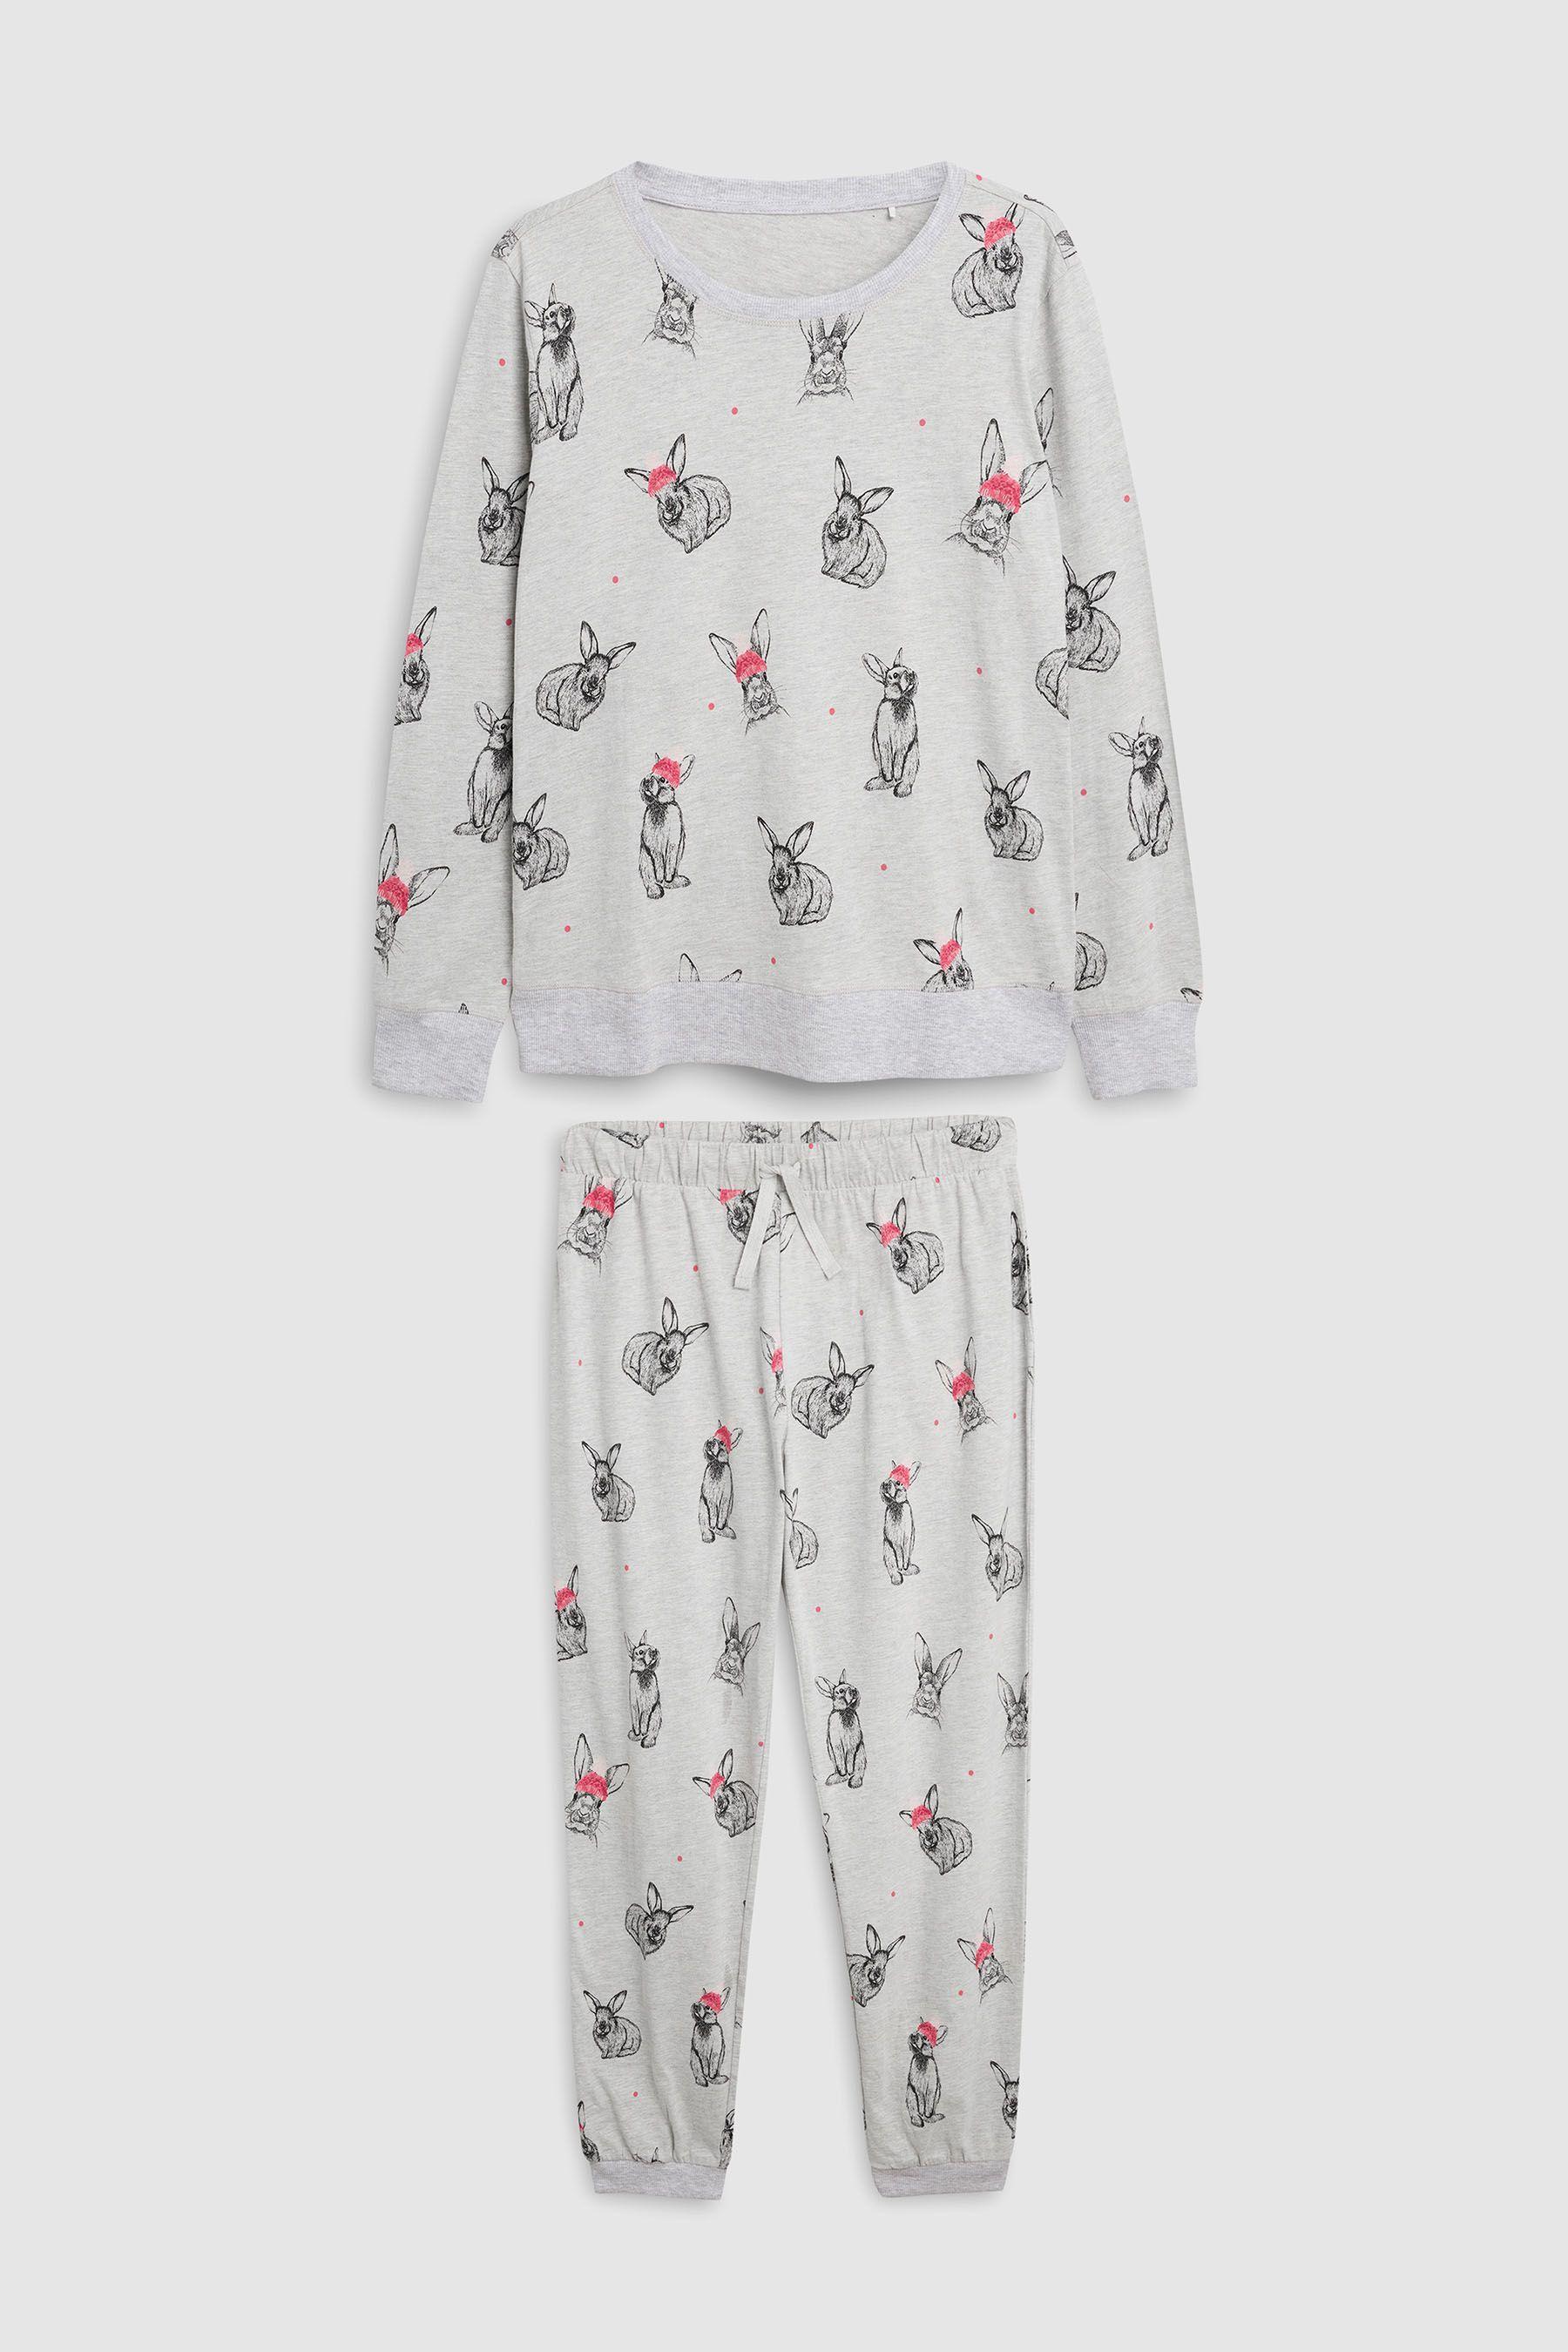 59f7b0bb86 Buy Christmas Bunny Pyjamas With Ribbon Wrapping מנקסט ישראל ...